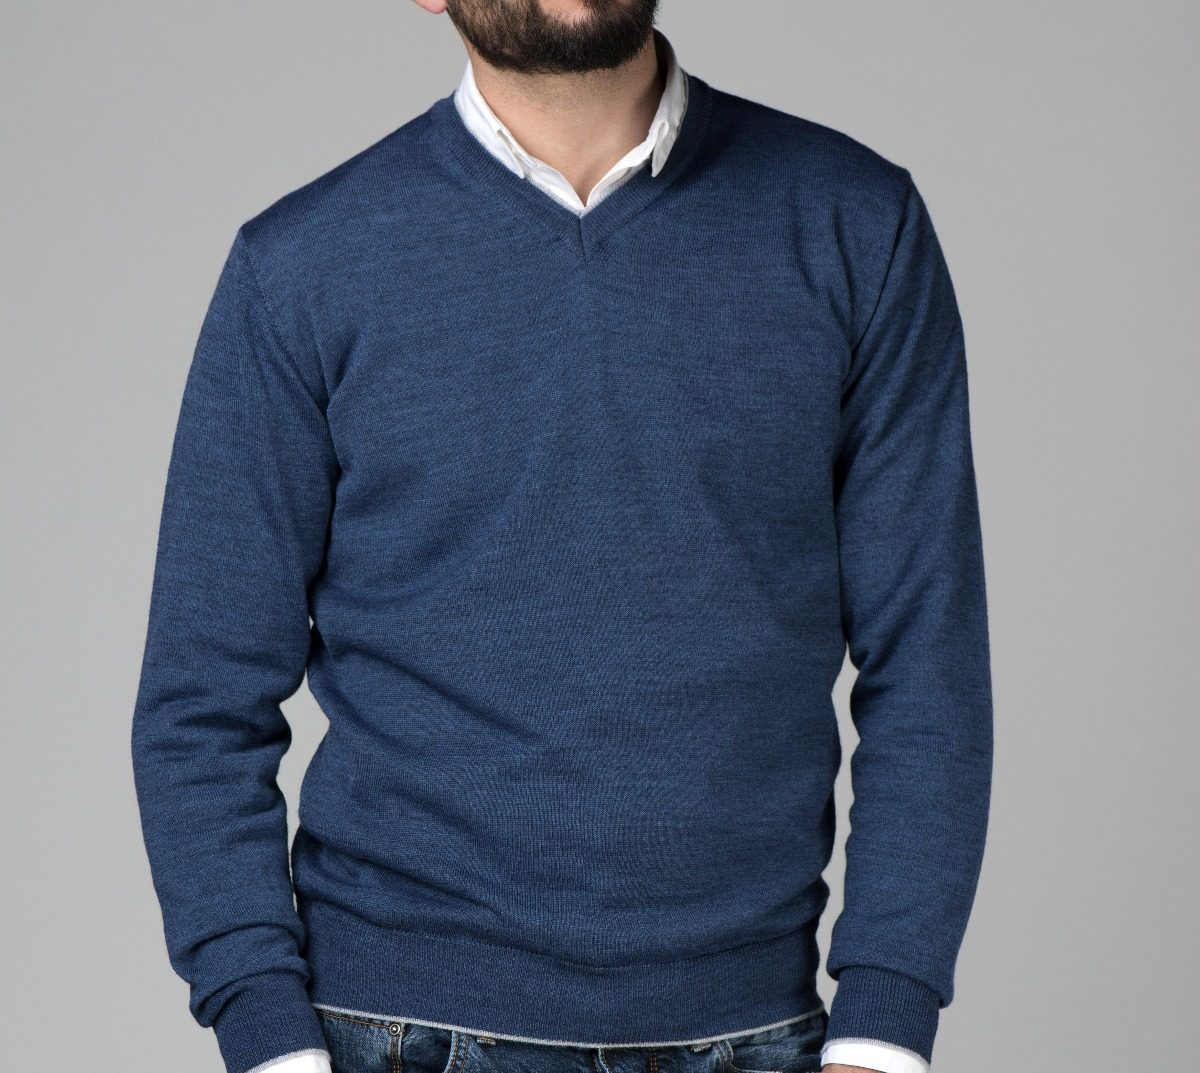 blusa italiana masculino gola malha sueter v tam. variados. Carregando zoom. 686b2290746